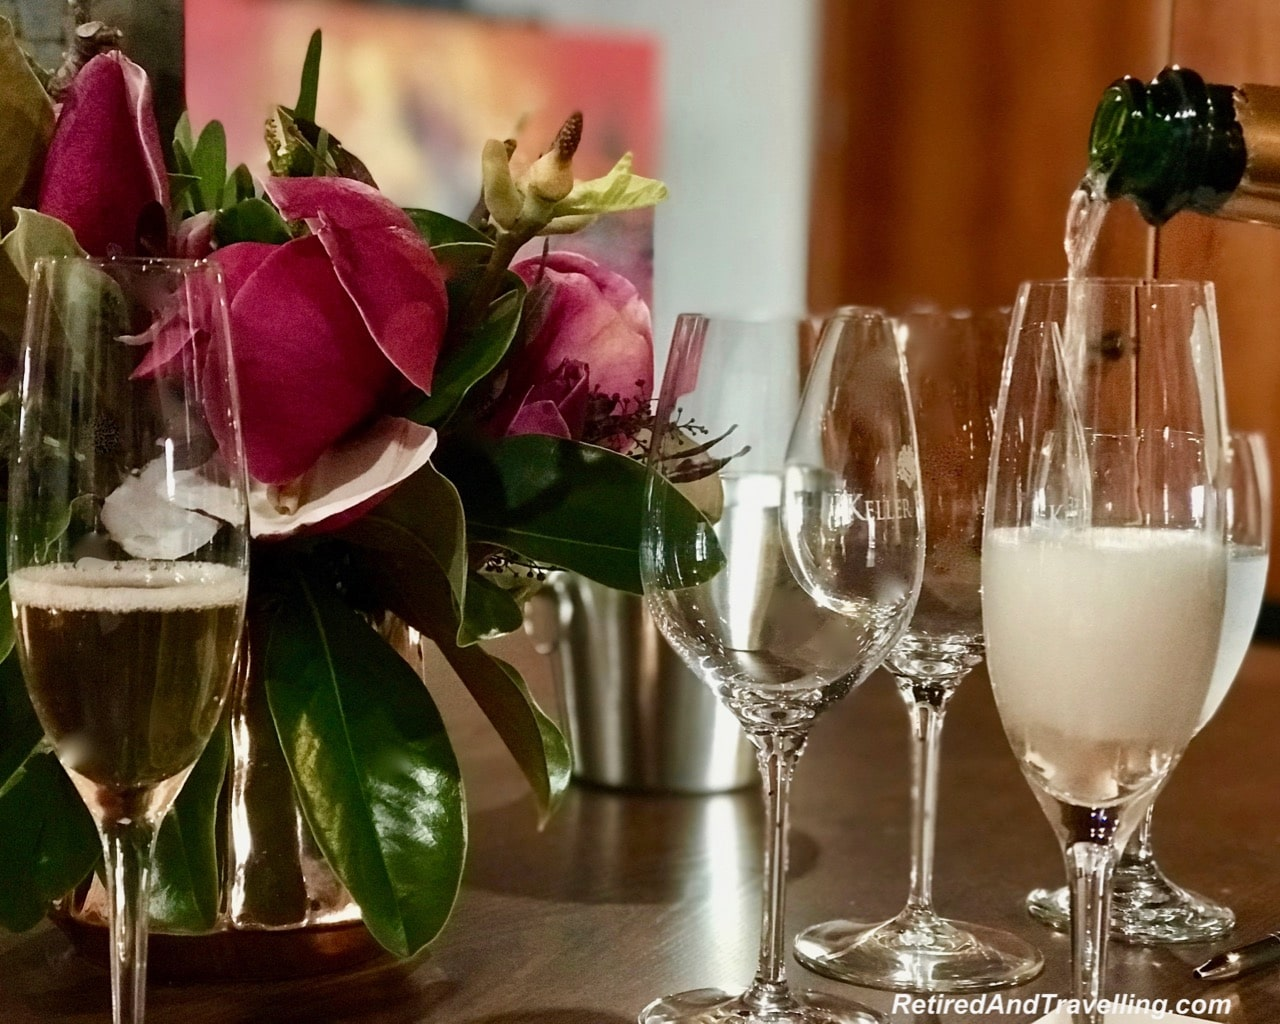 Brut Rose Keller Estates - Wine Tasting Experience In Napa.jpg